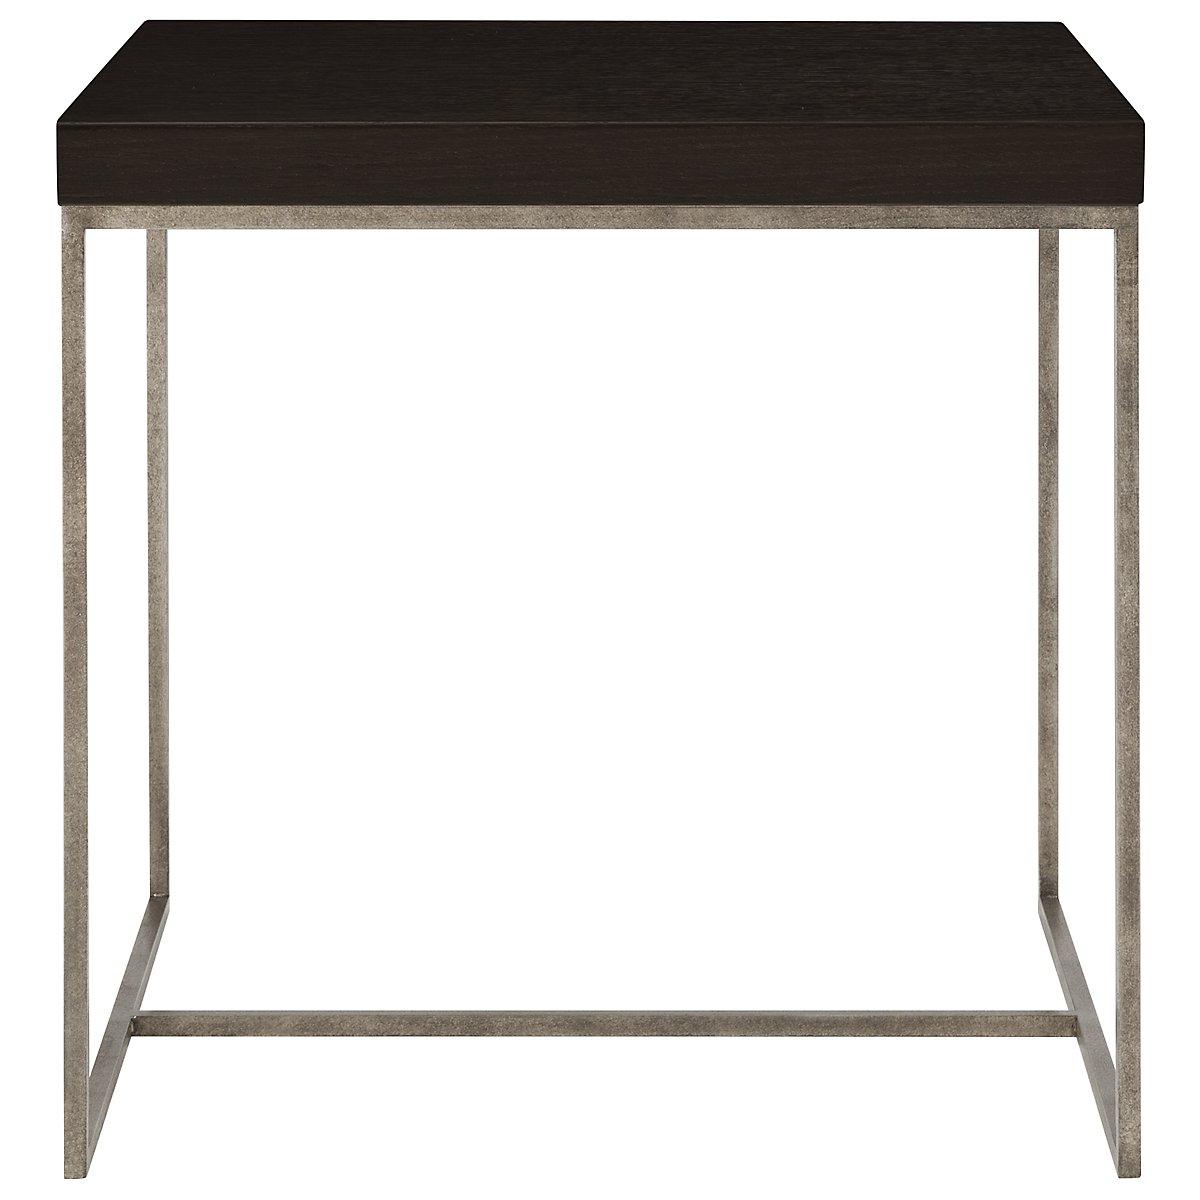 Tocara Dark Tone Square End Table